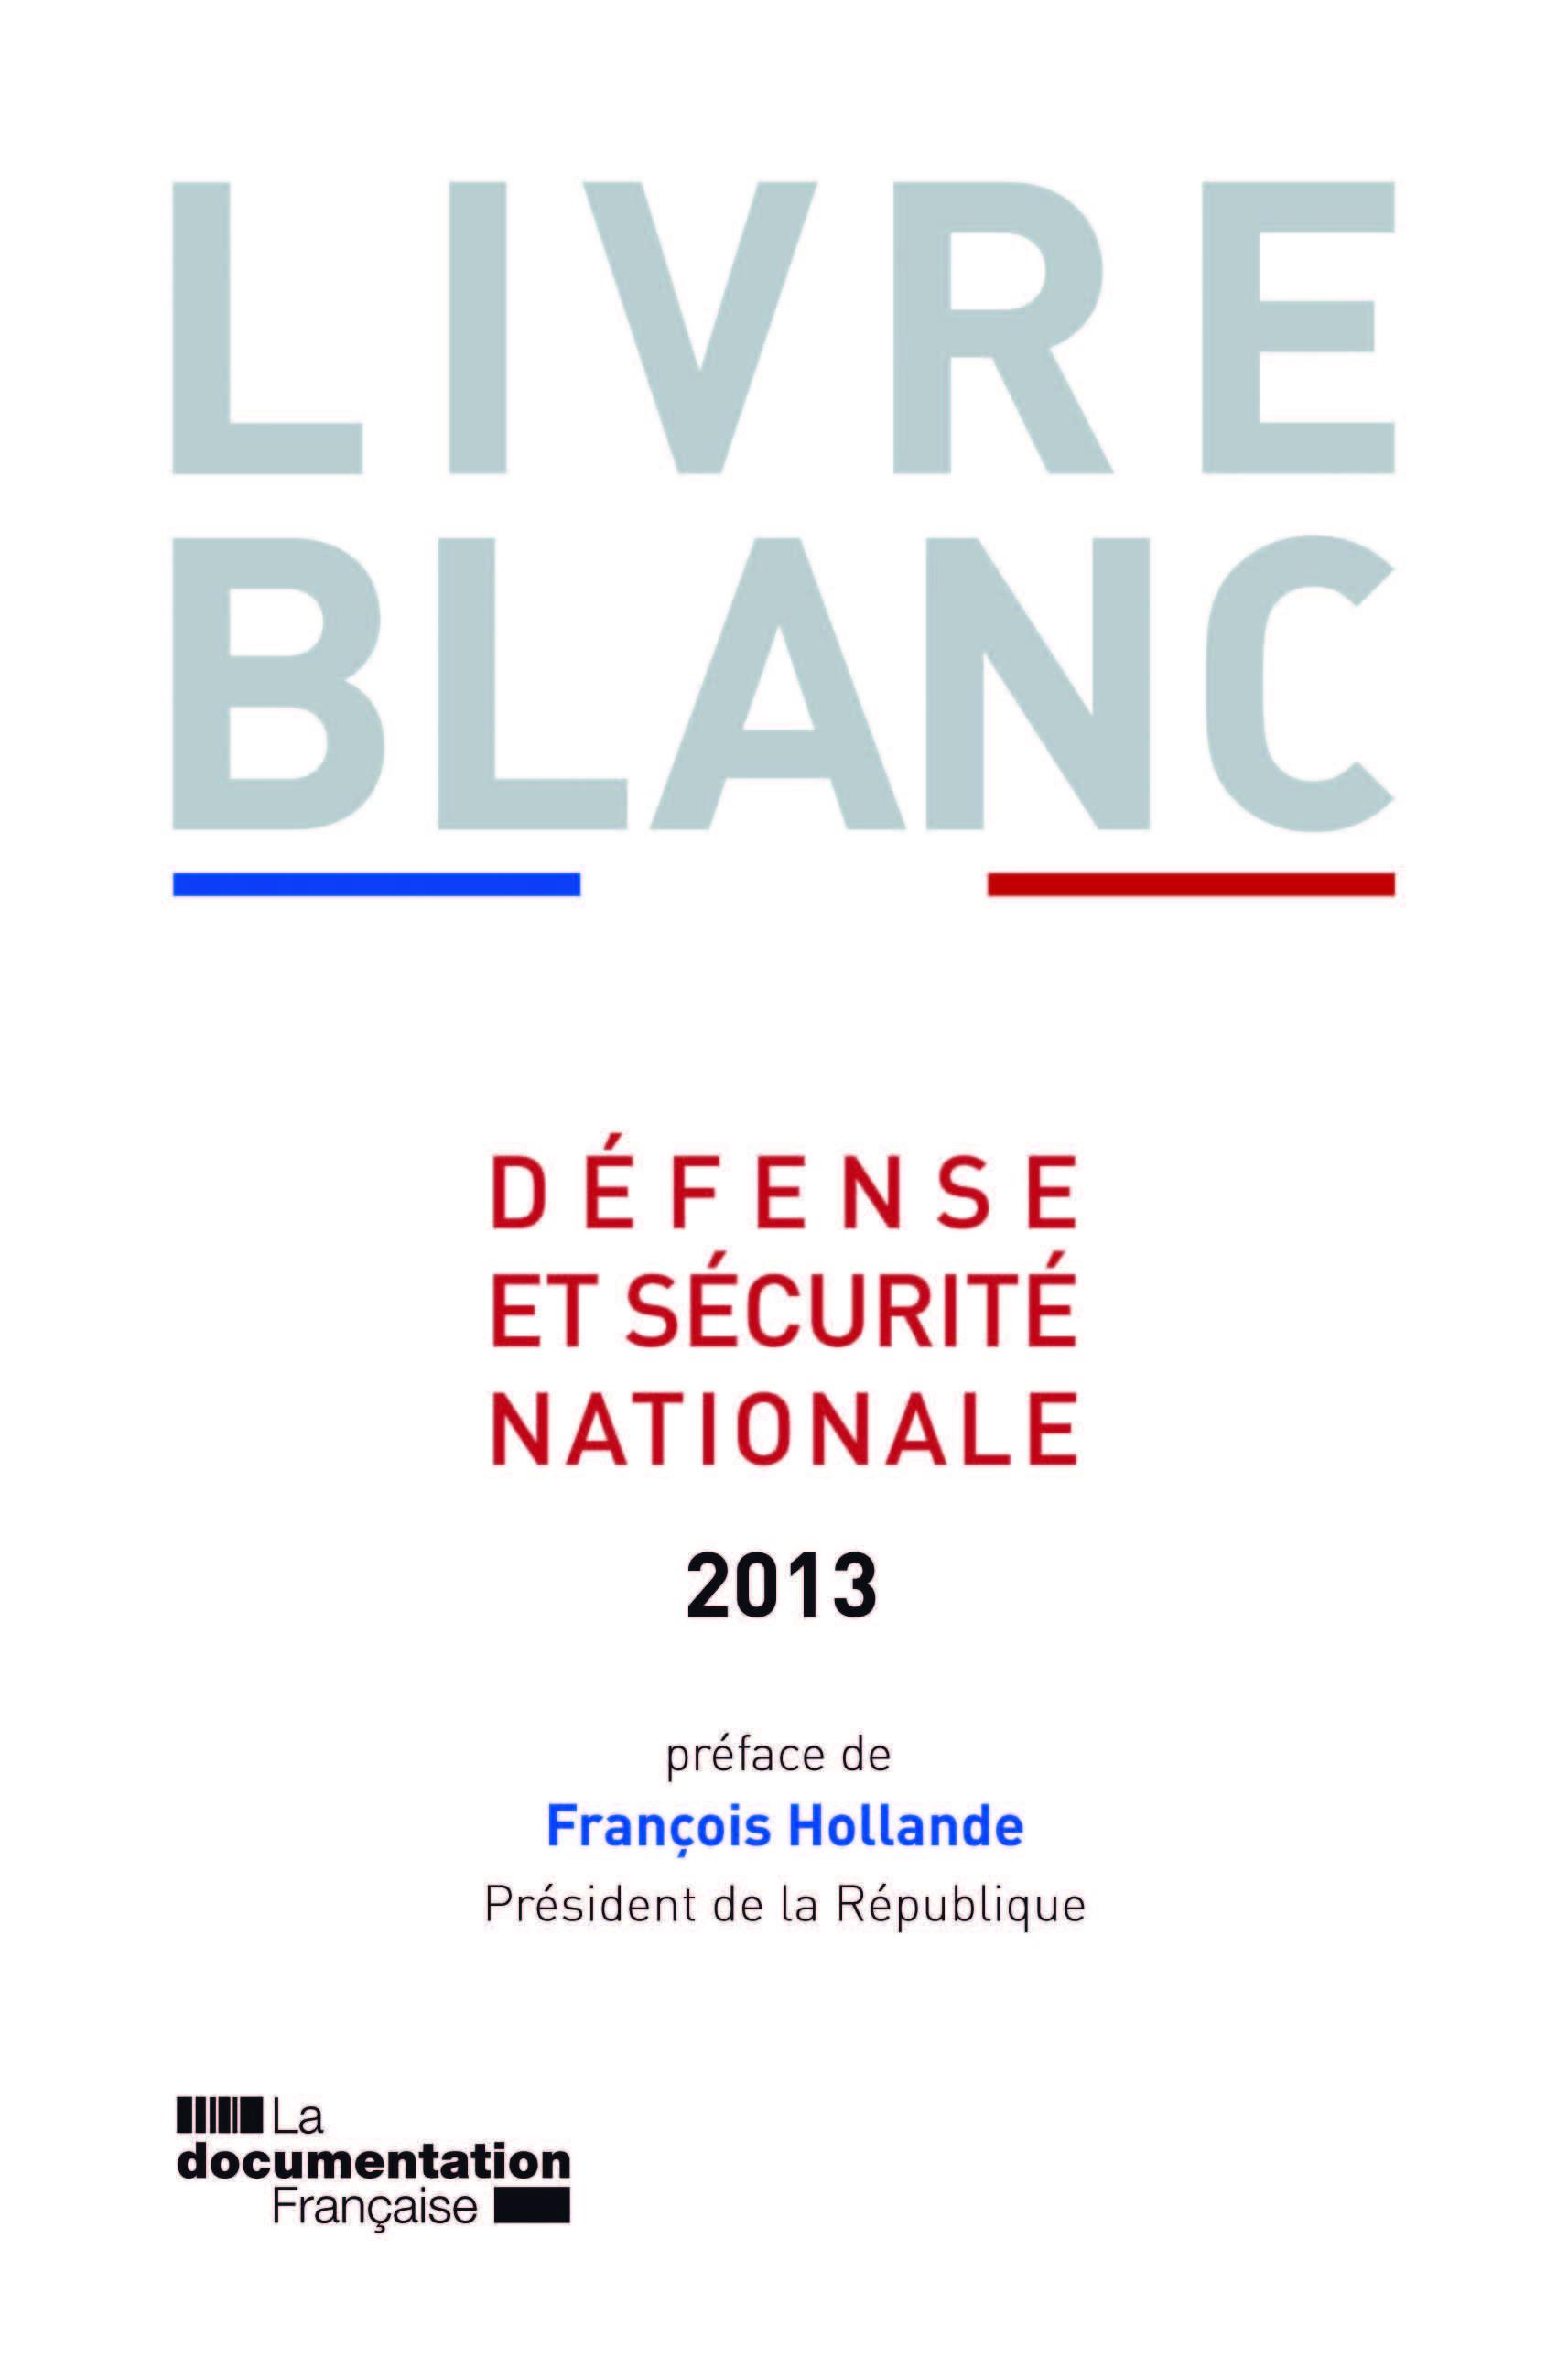 COLLECTIF - PREFACE DE FRANCOIS HOLLANDE - PRESIDENT DE LA REPUBLIQUE